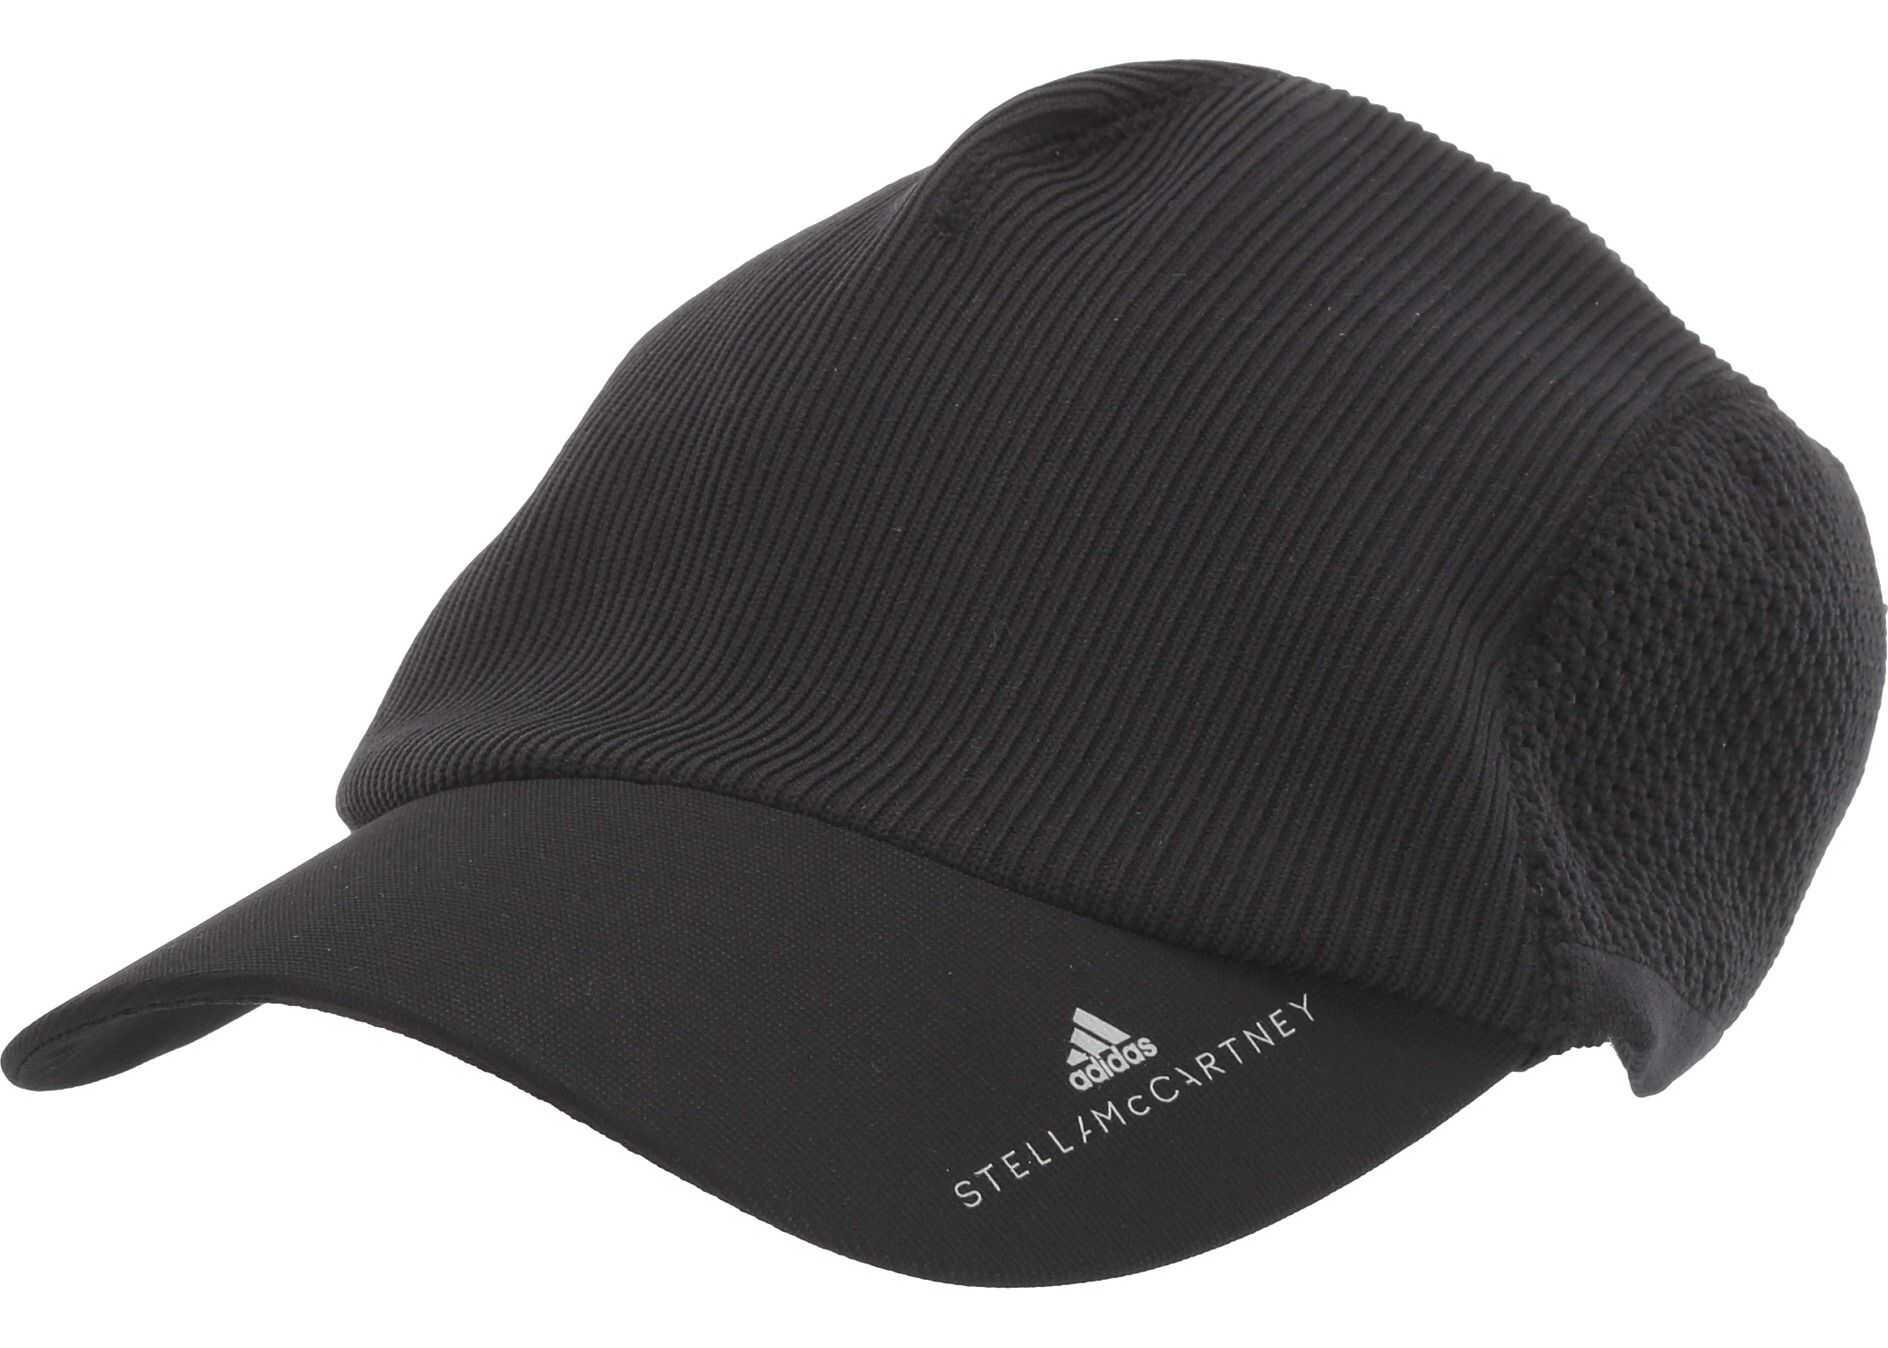 adidas by Stella McCartney Run Cap Knit DZ4855 Black/Reflective Silver